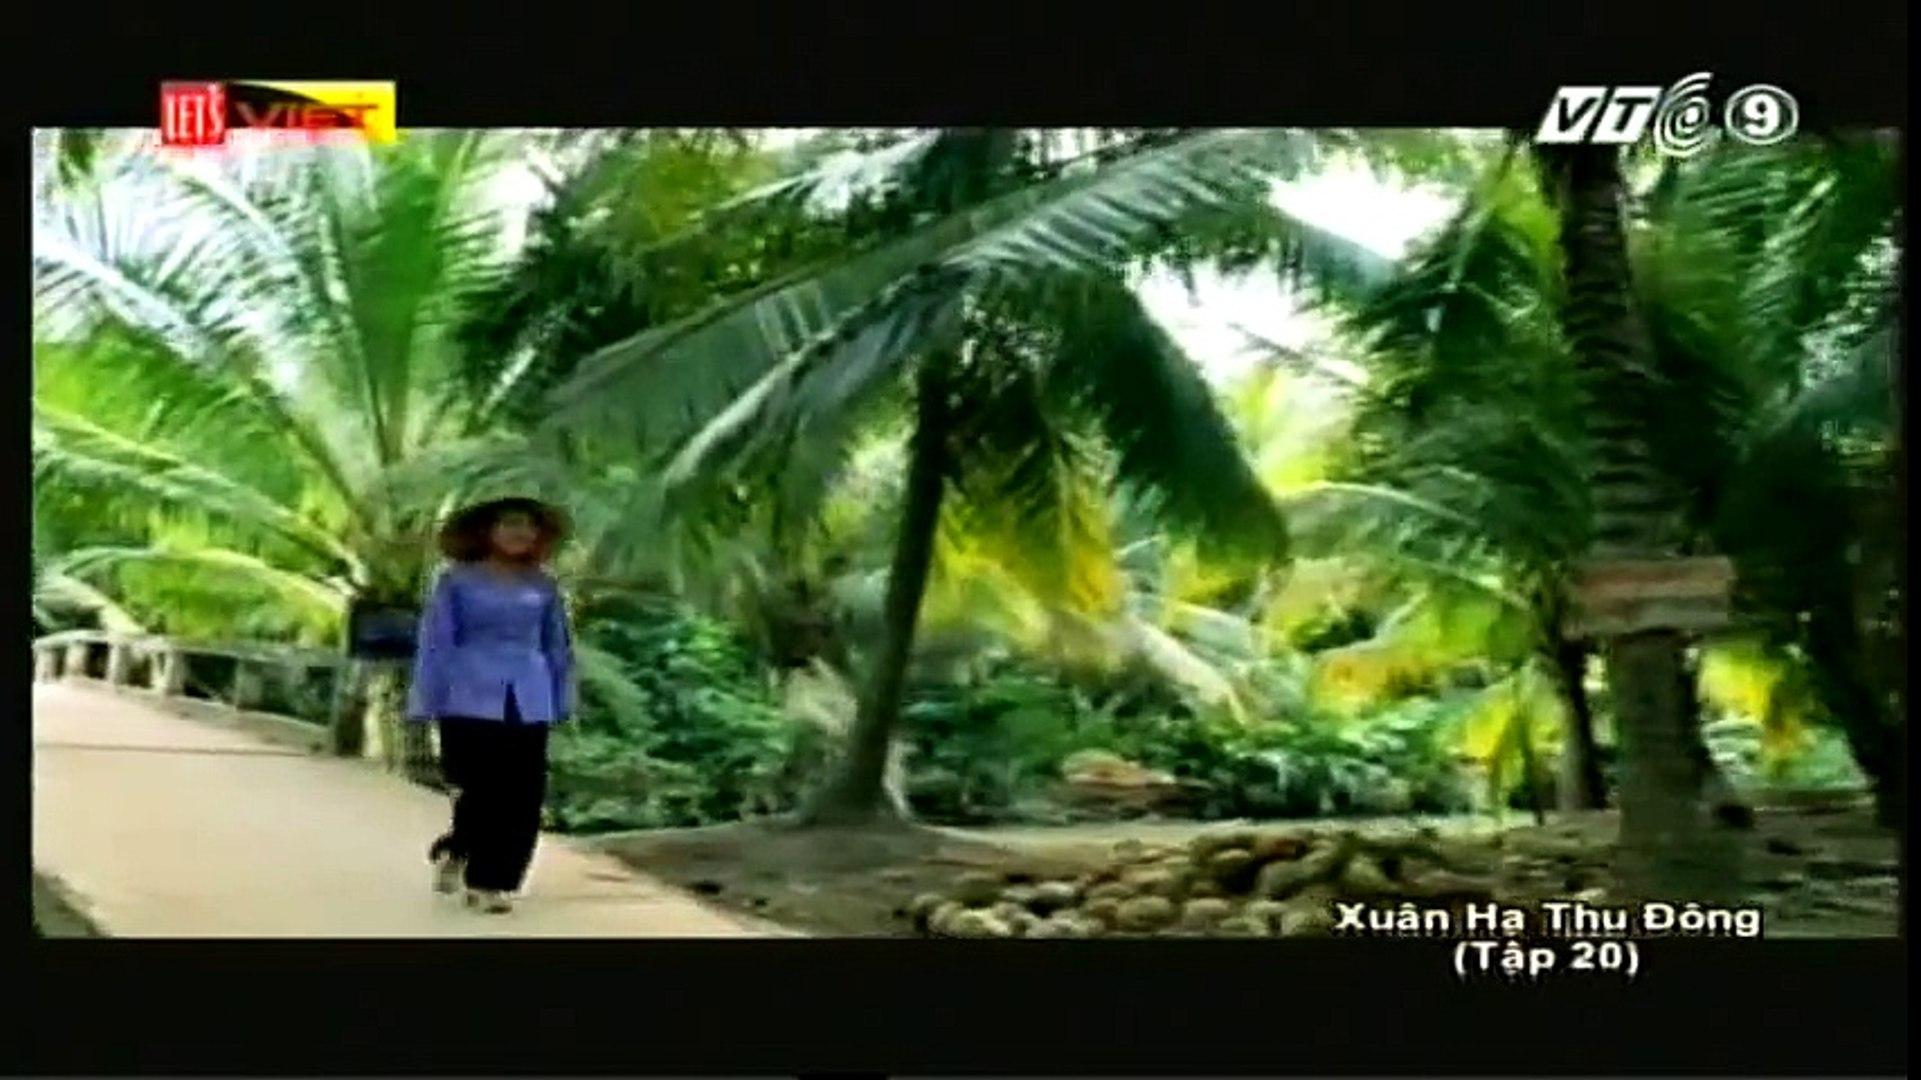 Xuan Ha Thu Dong Tap 20 - Phim Viet Nam - HTV7